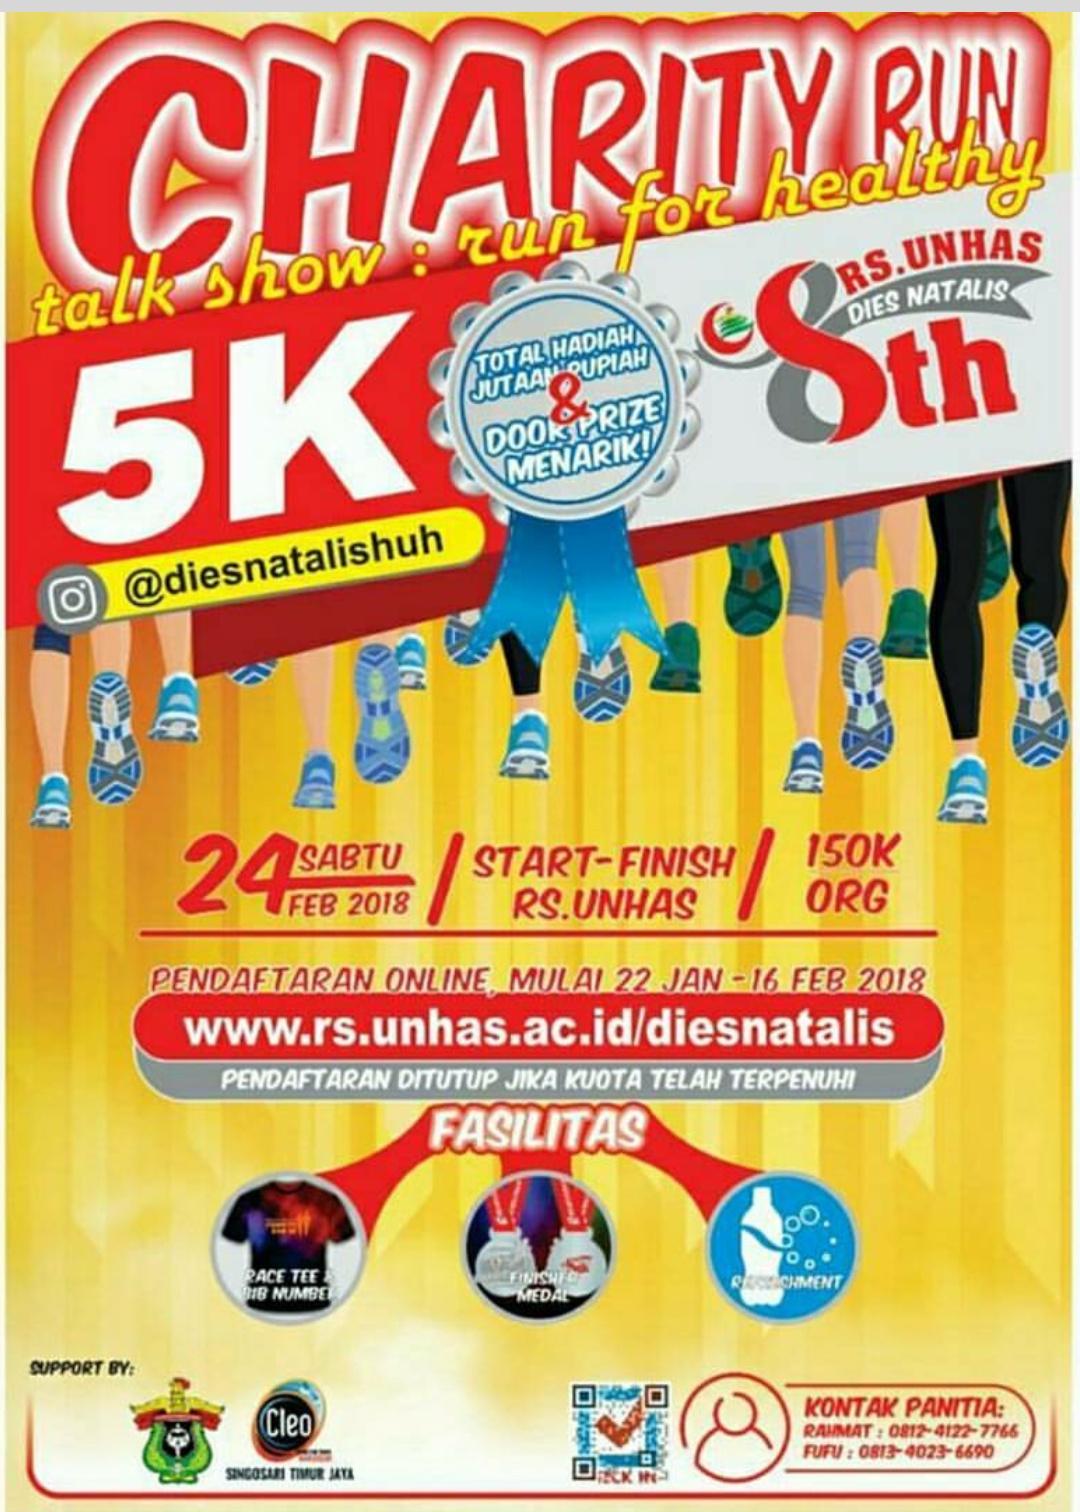 Unhas Charity Run • 2018